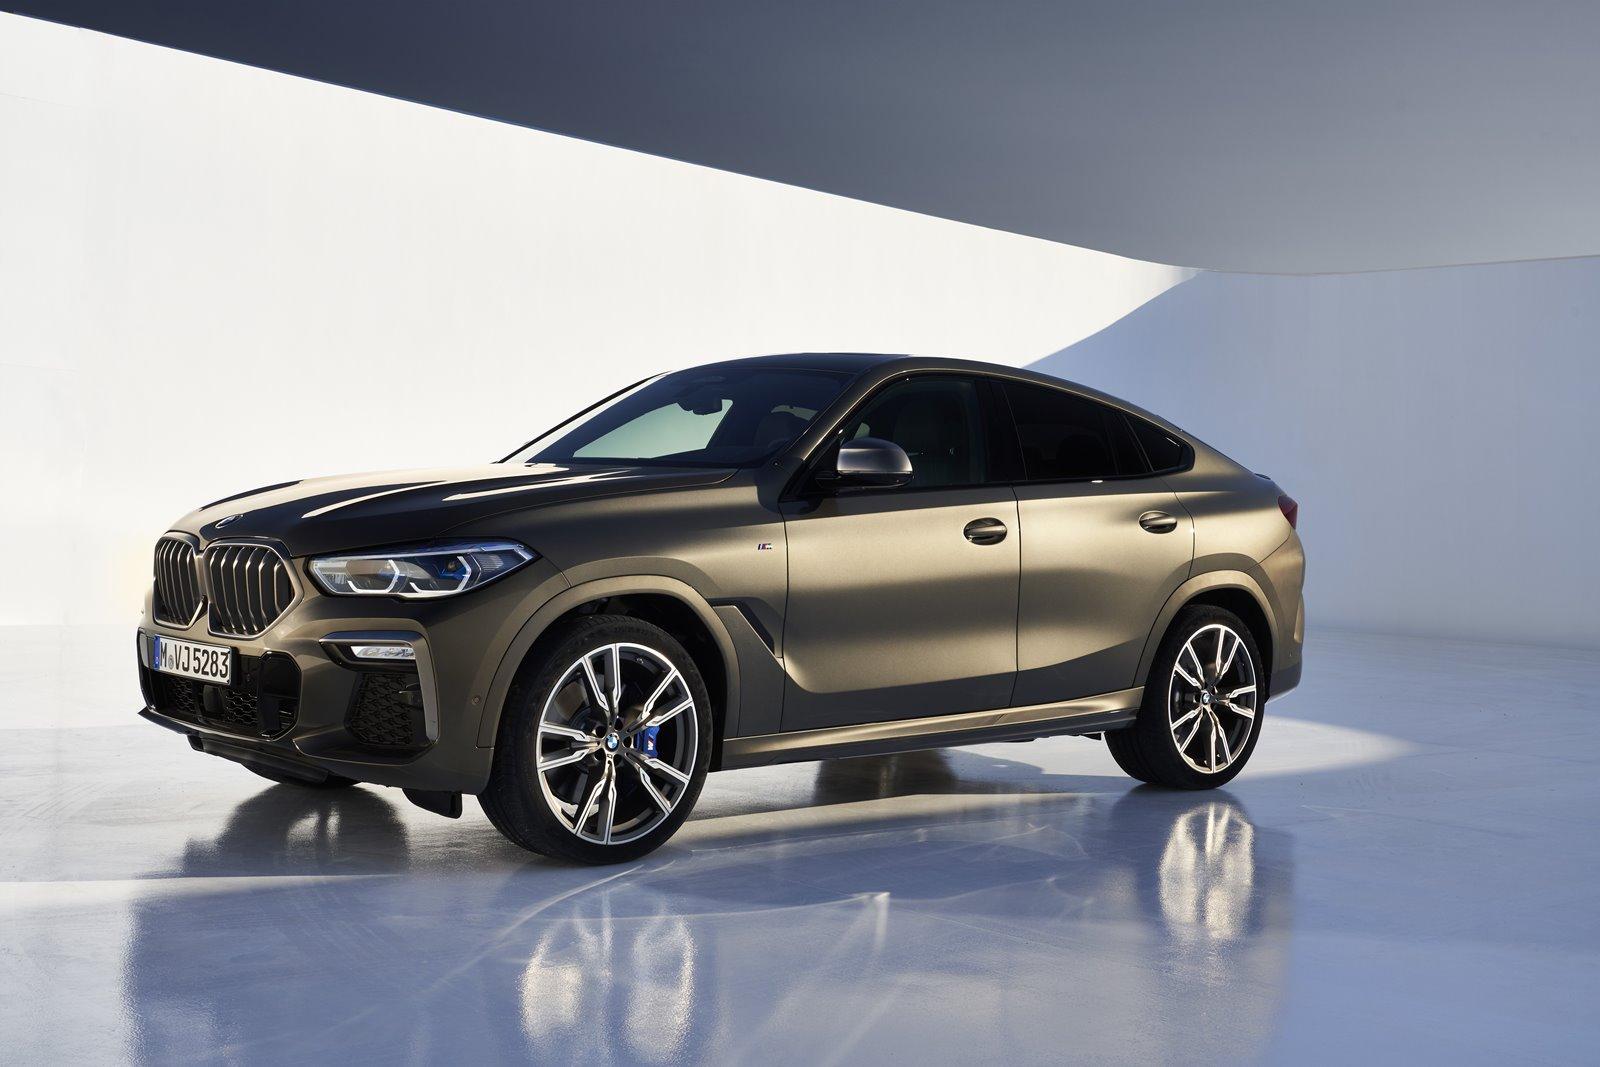 Precios del BMW X6 2020 para España: Desde 81.650 euros